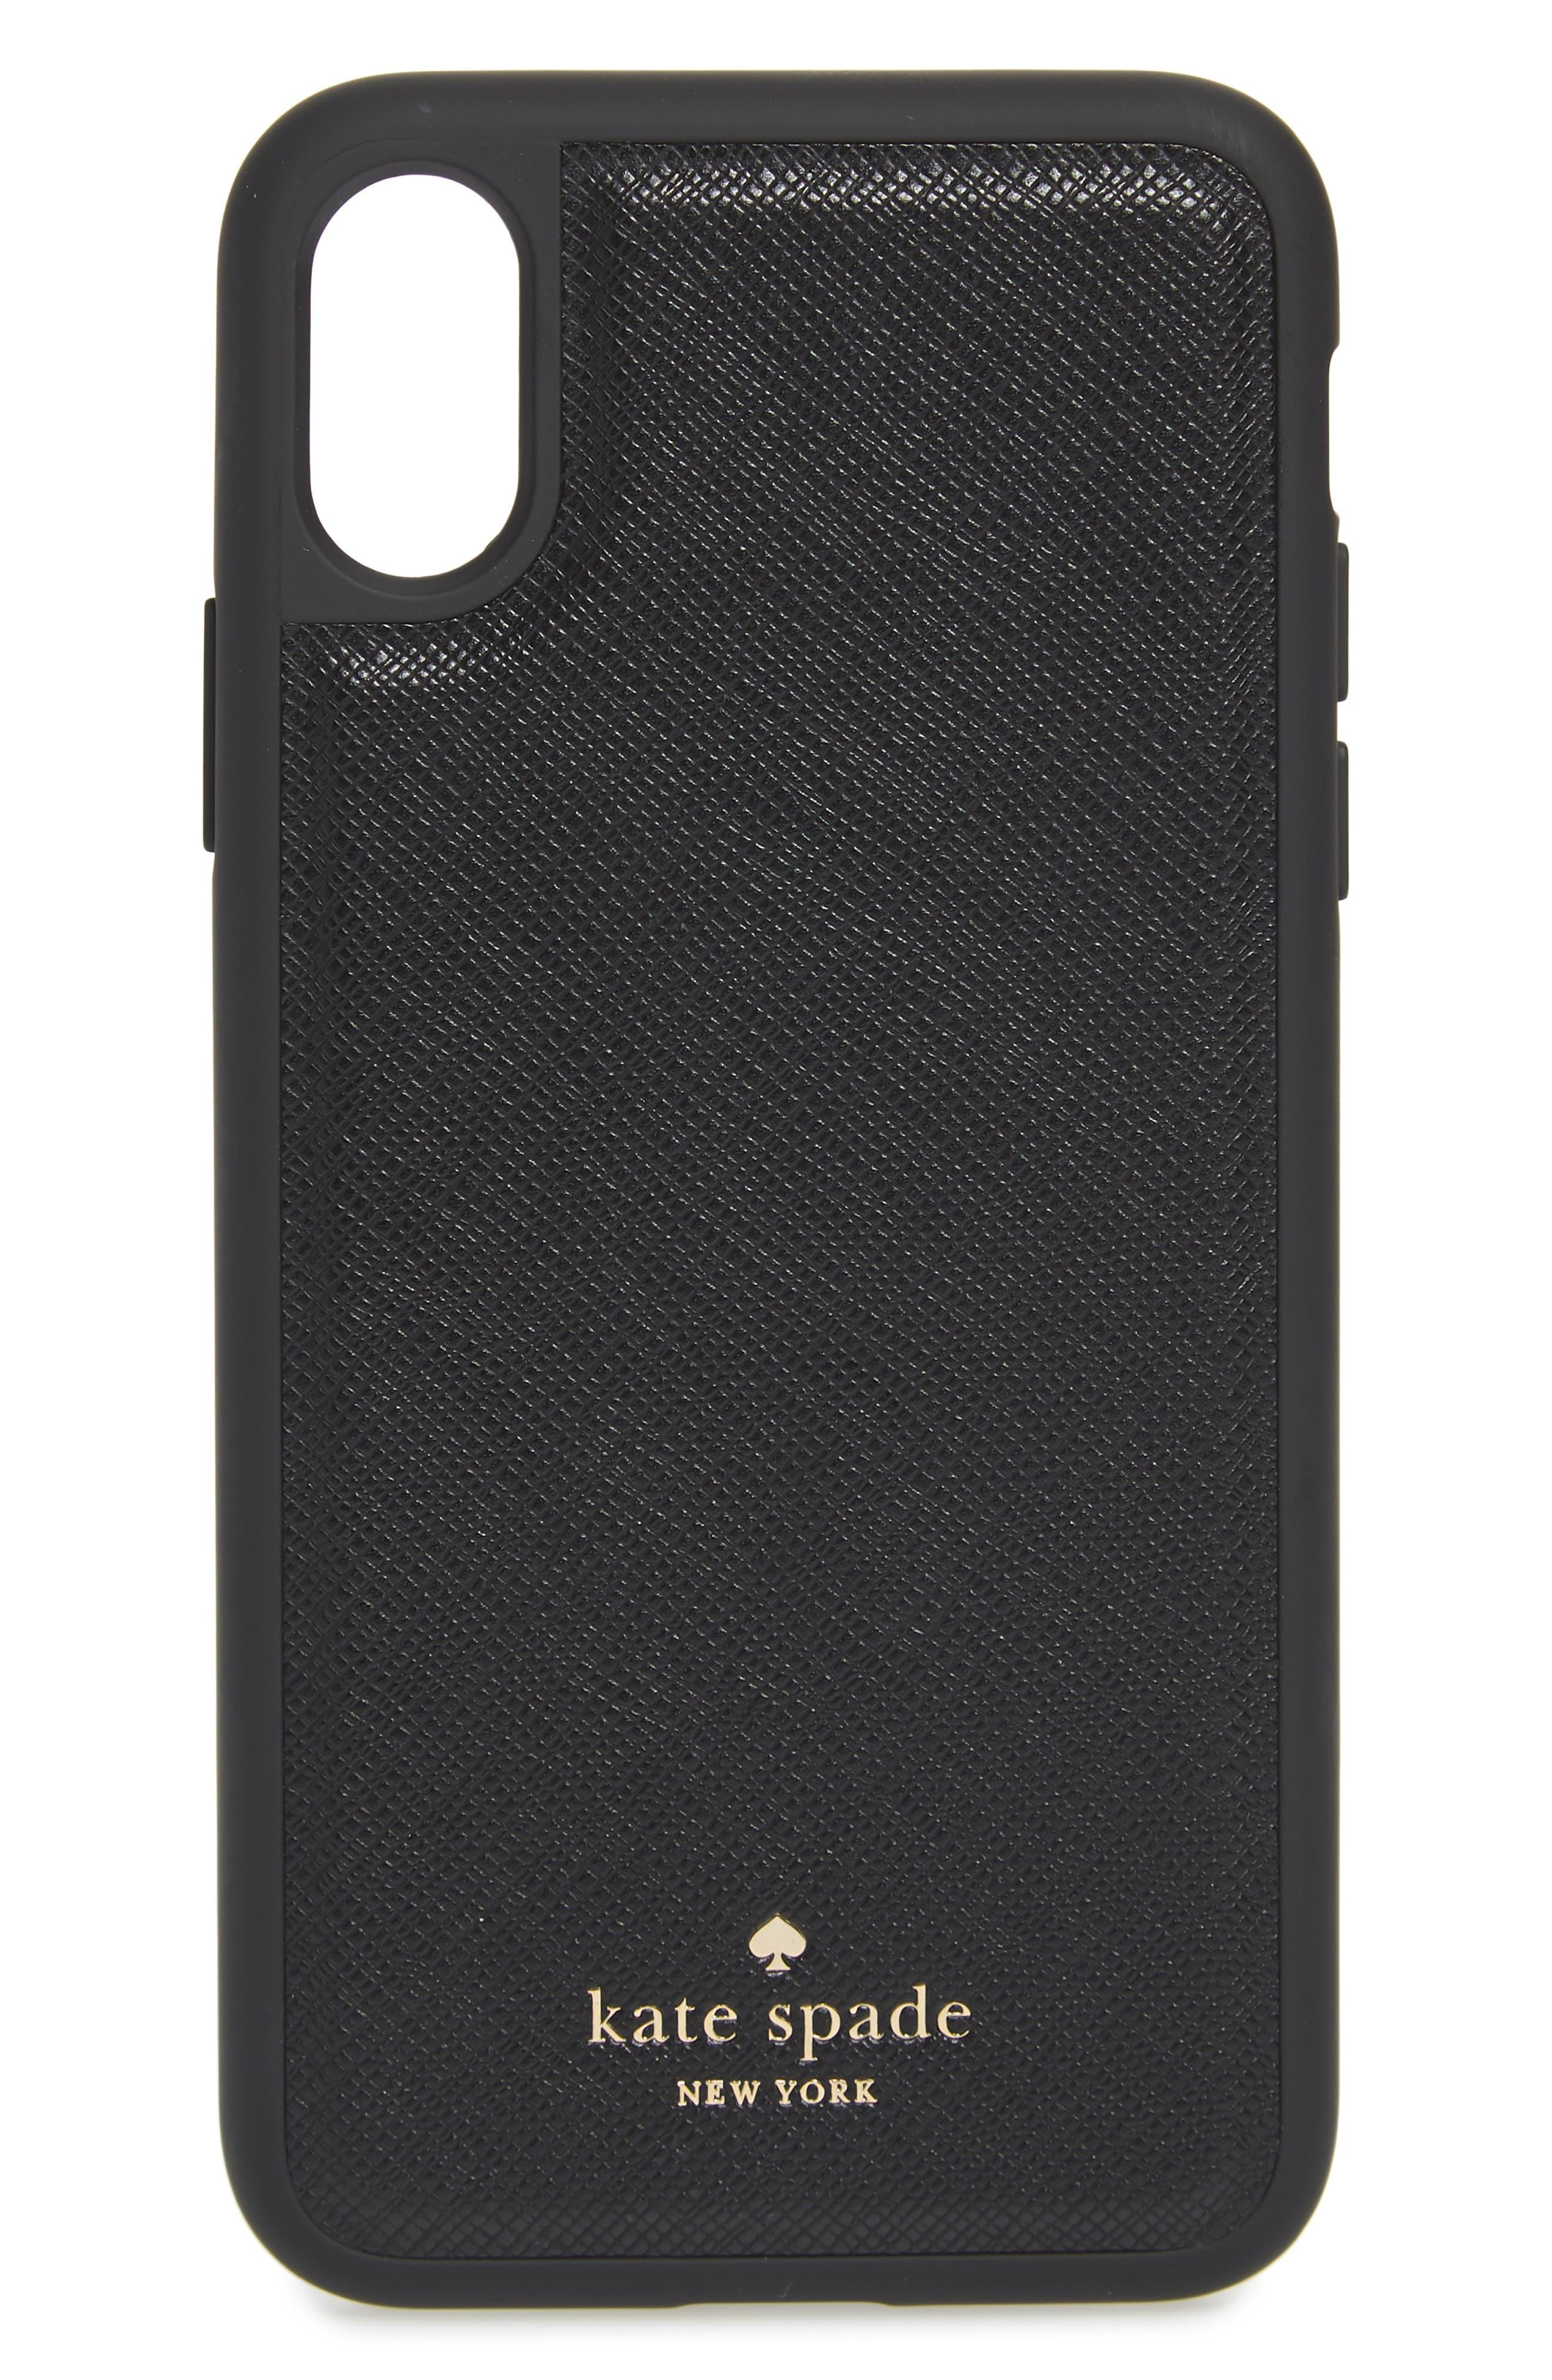 KATE SPADE NEW YORK,                             iPhone X/Xs/Xs Max & XR magnetic wrap folio case,                             Alternate thumbnail 4, color,                             BLACK/ TUSK